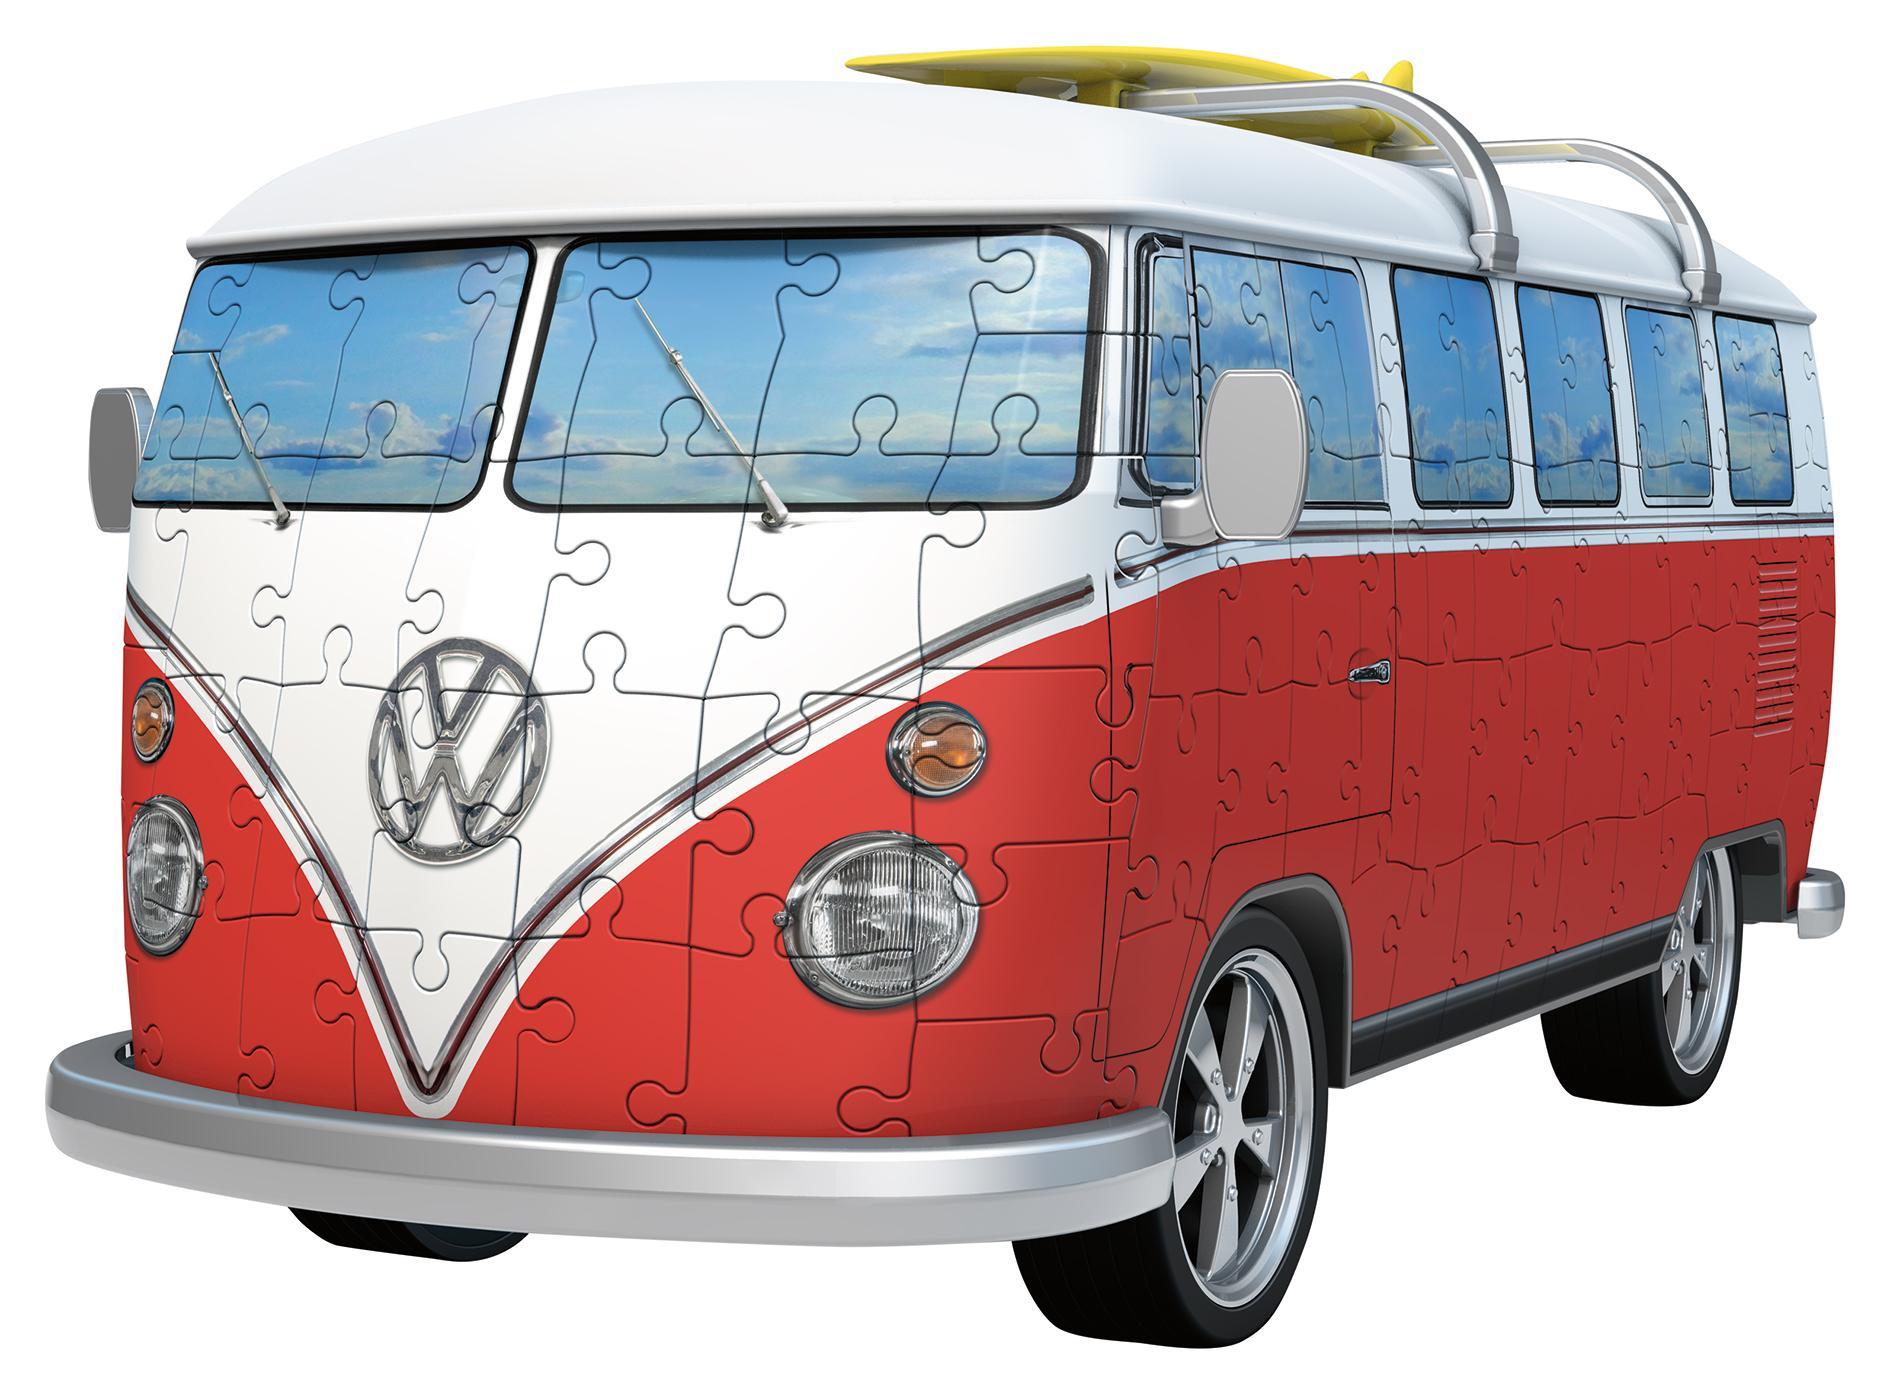 Ravensburger VW T1 Camper Van, 162pc 3D Jigsaw Puzzle: Ravensburger ...